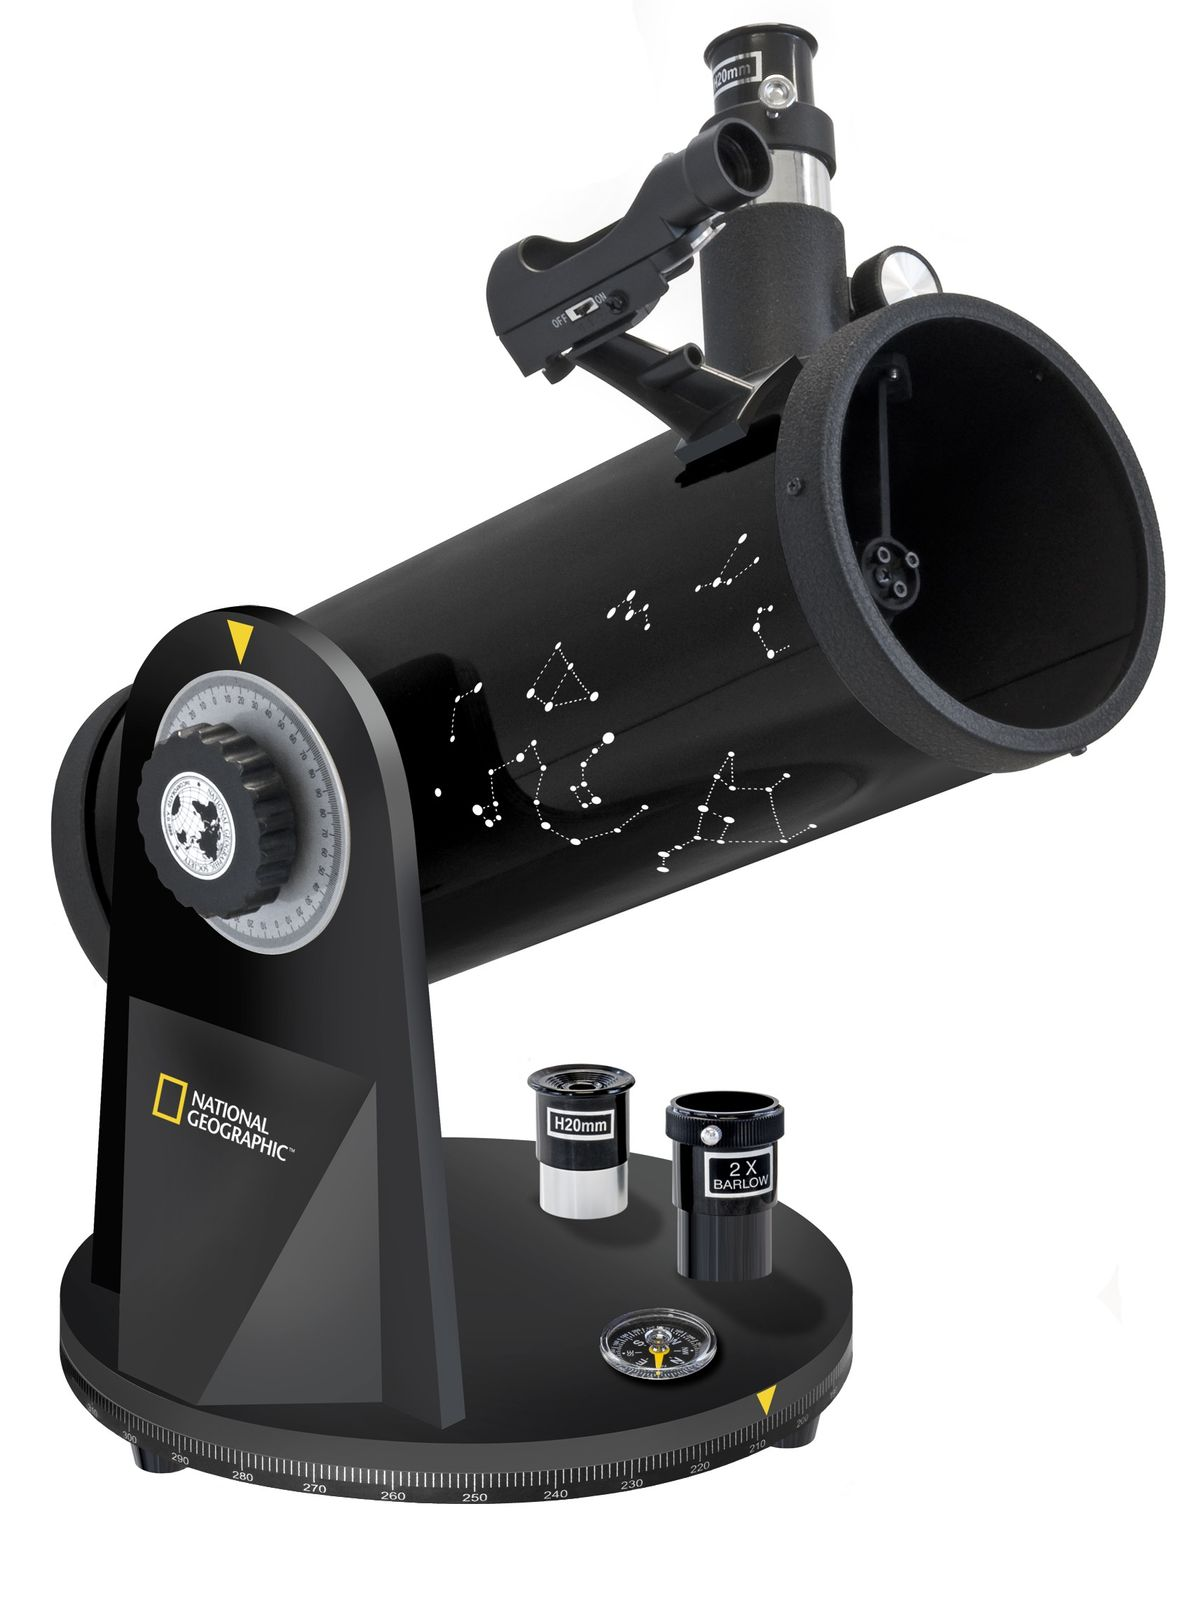 NATIONAL GEOGRAPHIC 114/500 Kompakt Teleskop